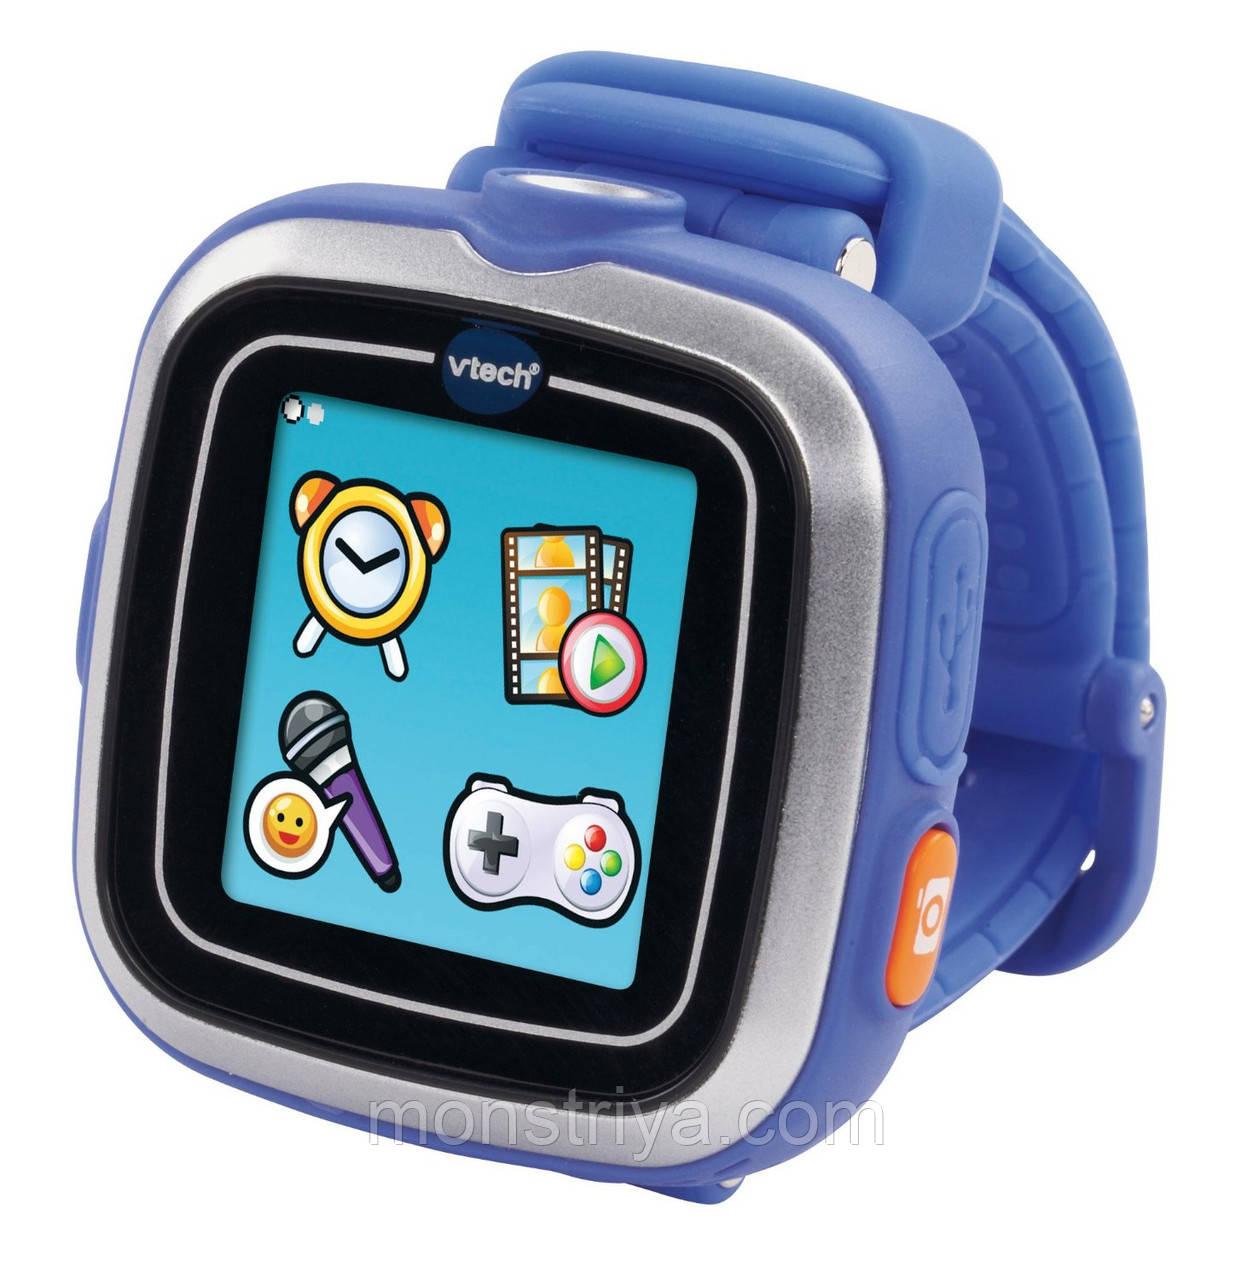 VTech Kidizoom Smartwatch VTech Kidizoom розумні годинник для дітей